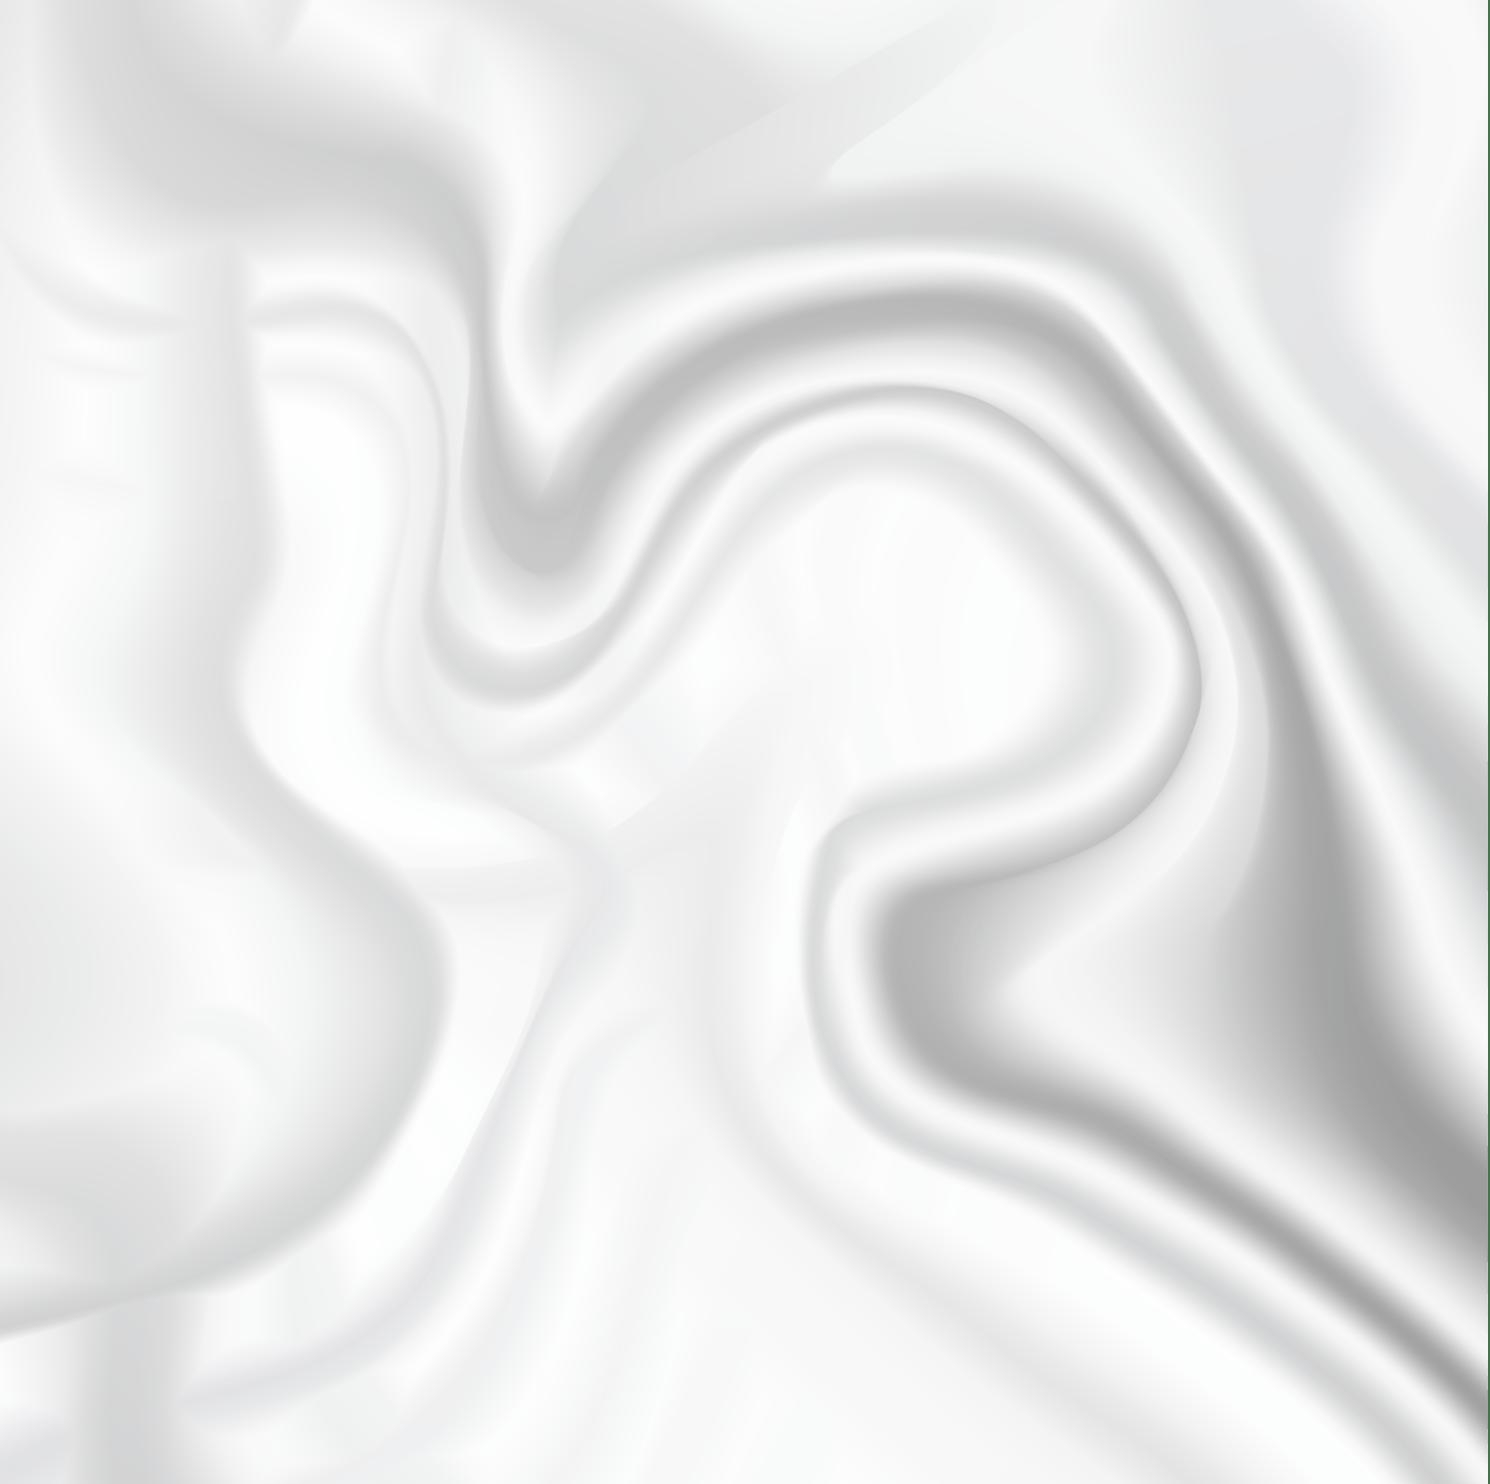 marble_texture_backgr...